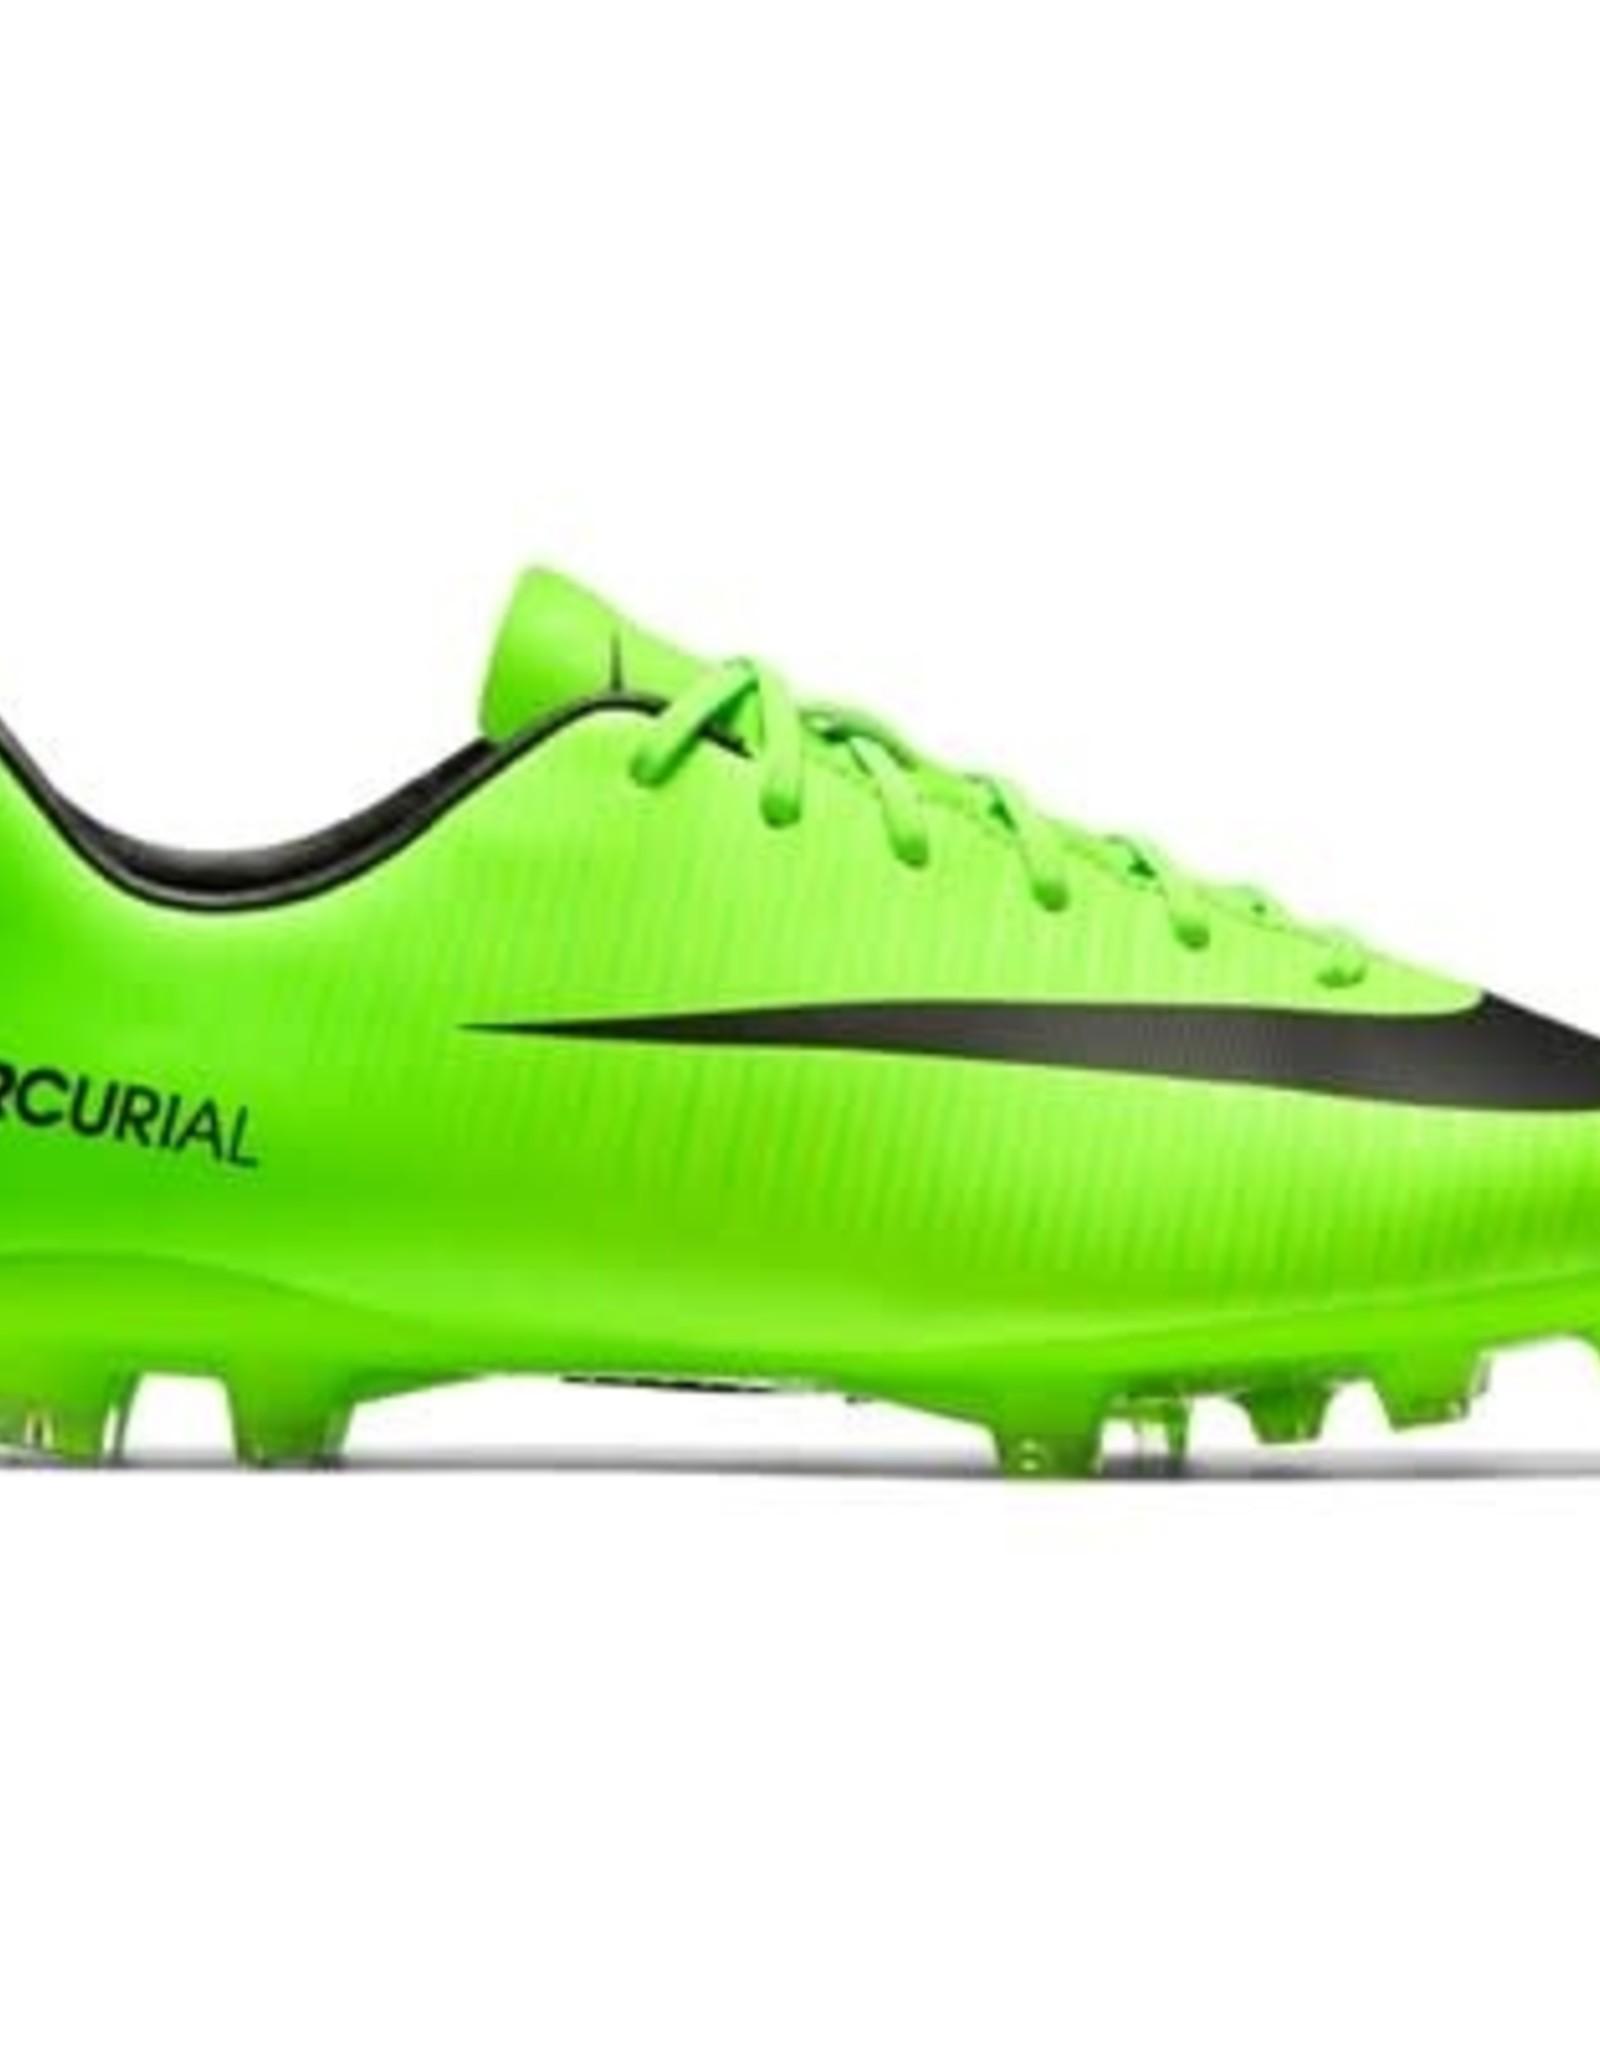 Nike NikeMercurialVictory VI FG Youth